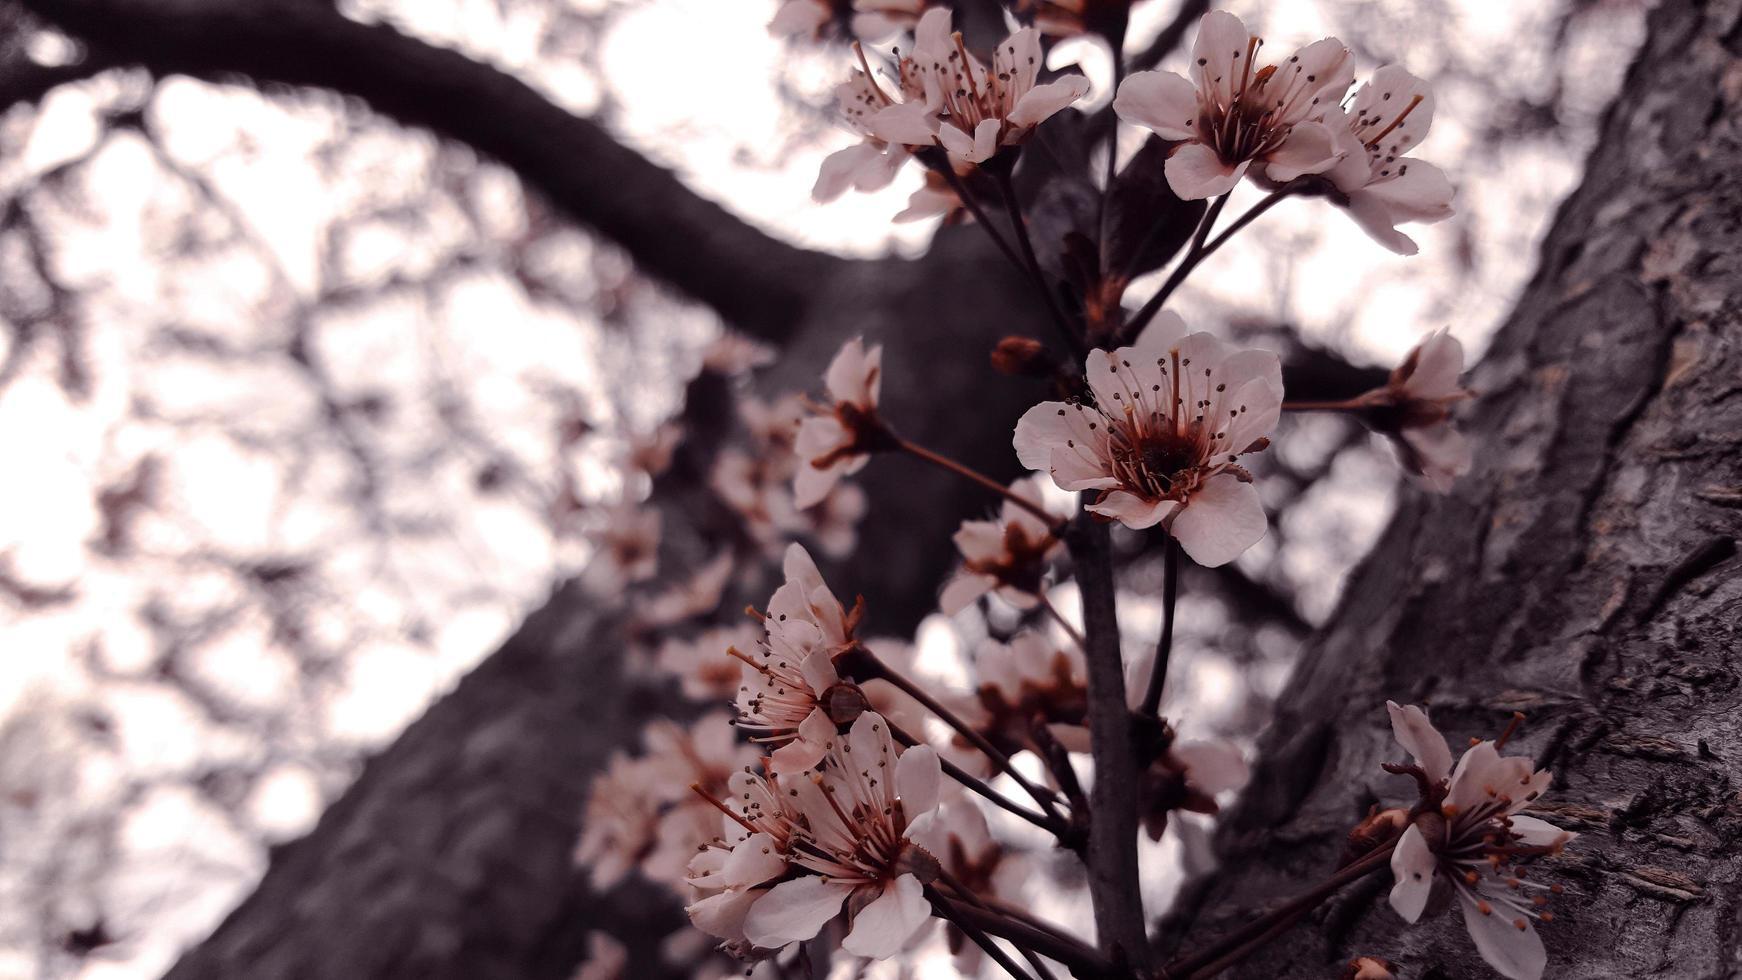 kersenbloesemboom foto